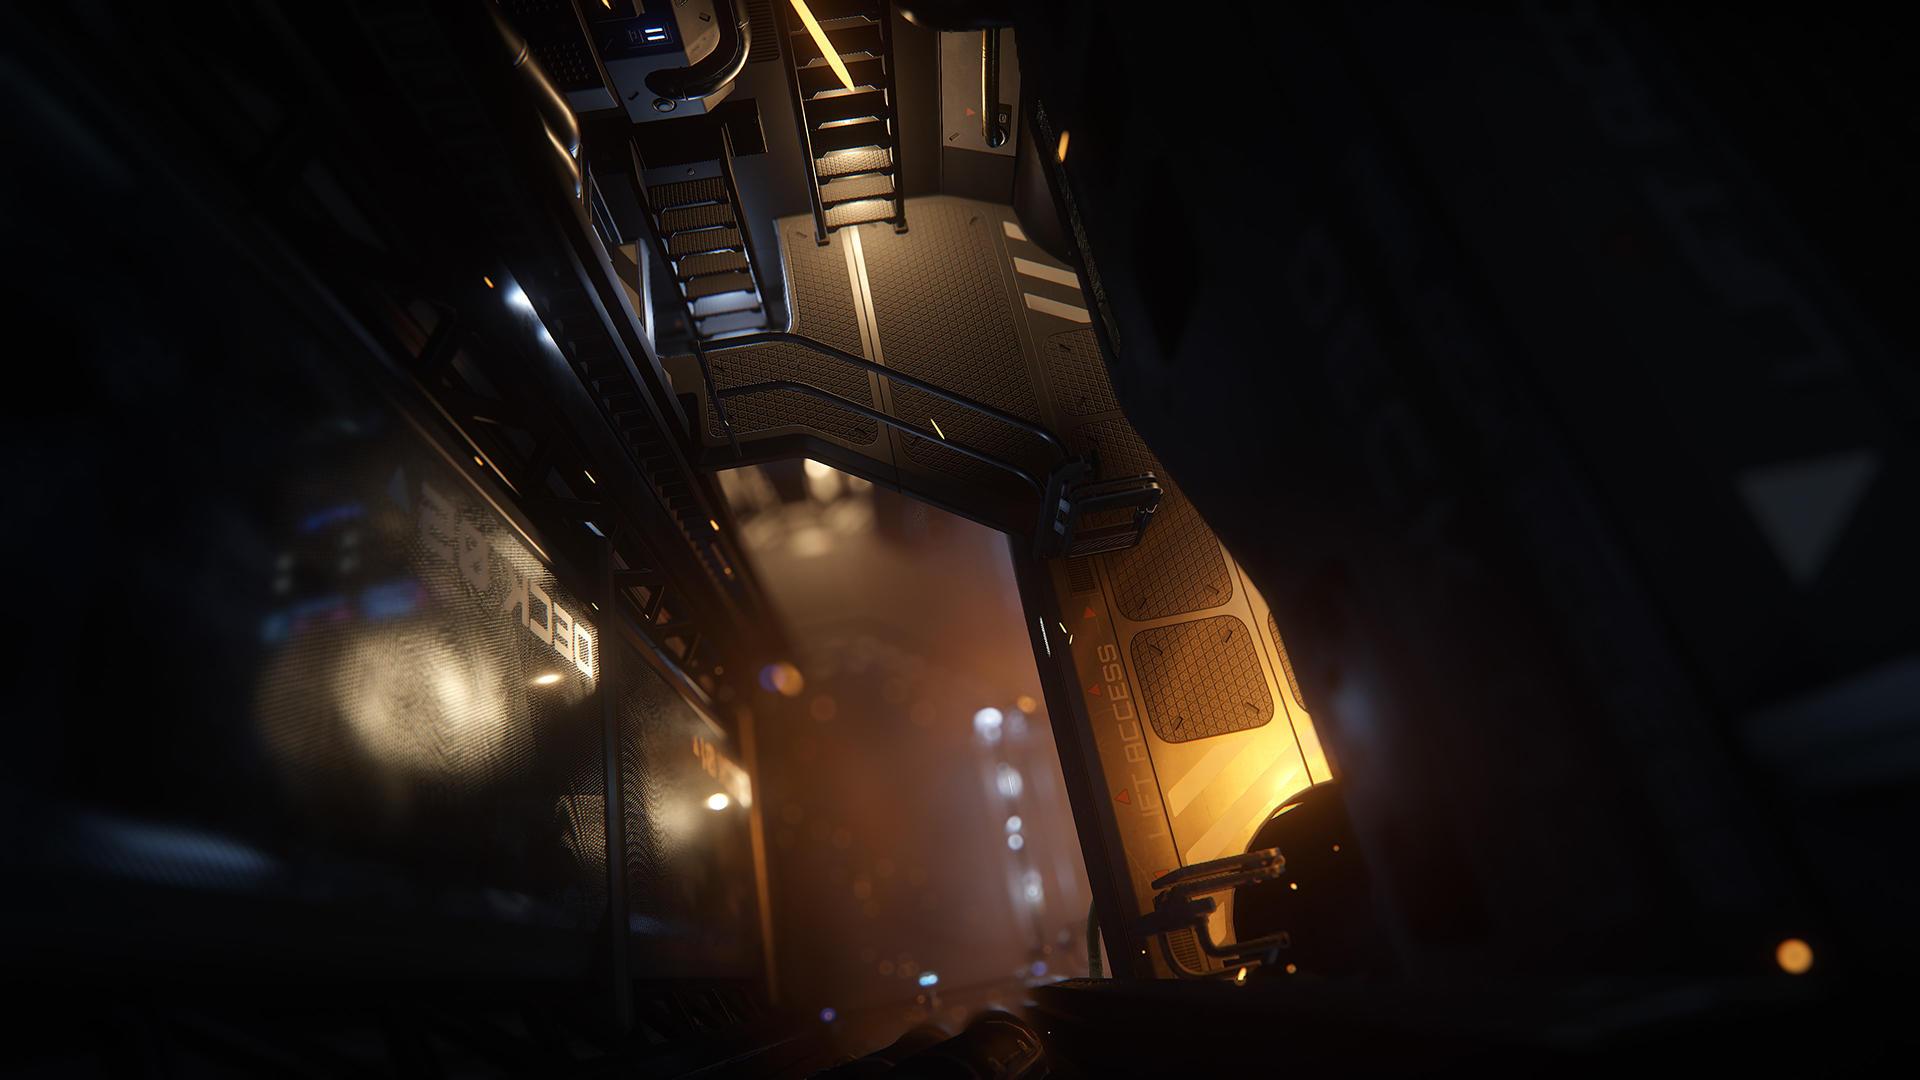 Hull-C wnętrze